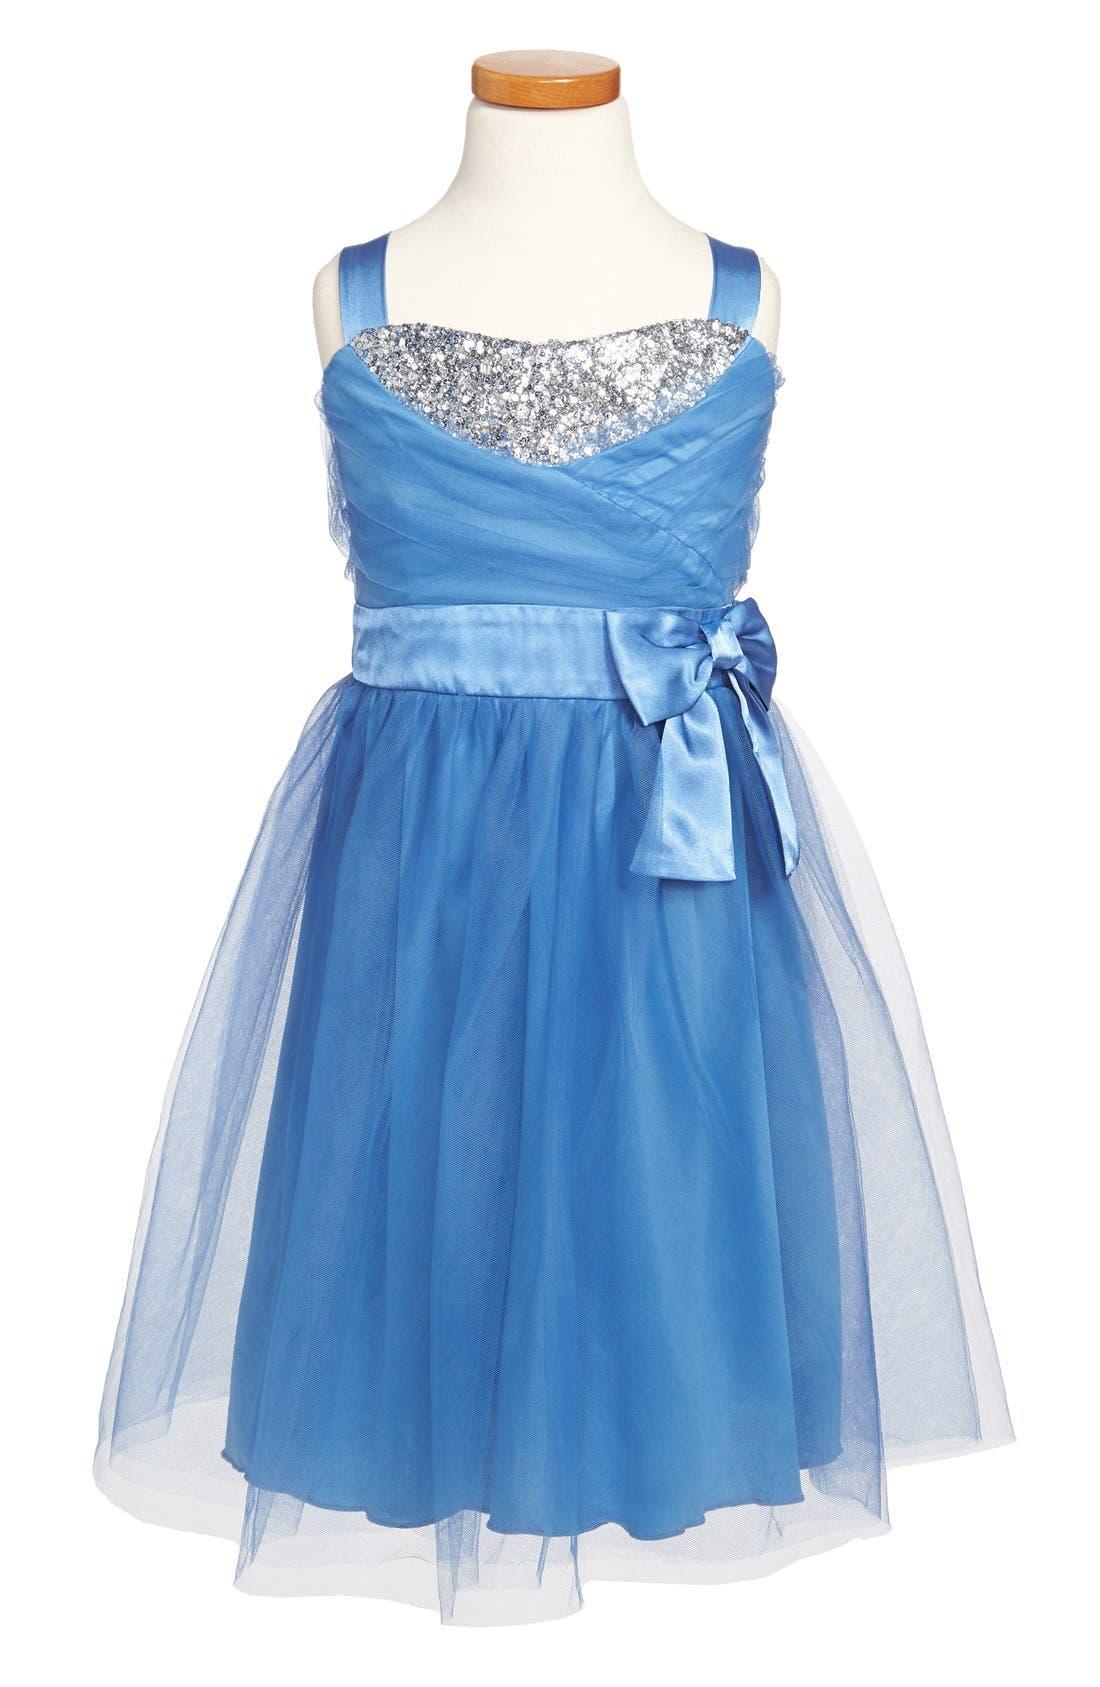 Main Image - Roxette Tulle Dress (Big Girls)